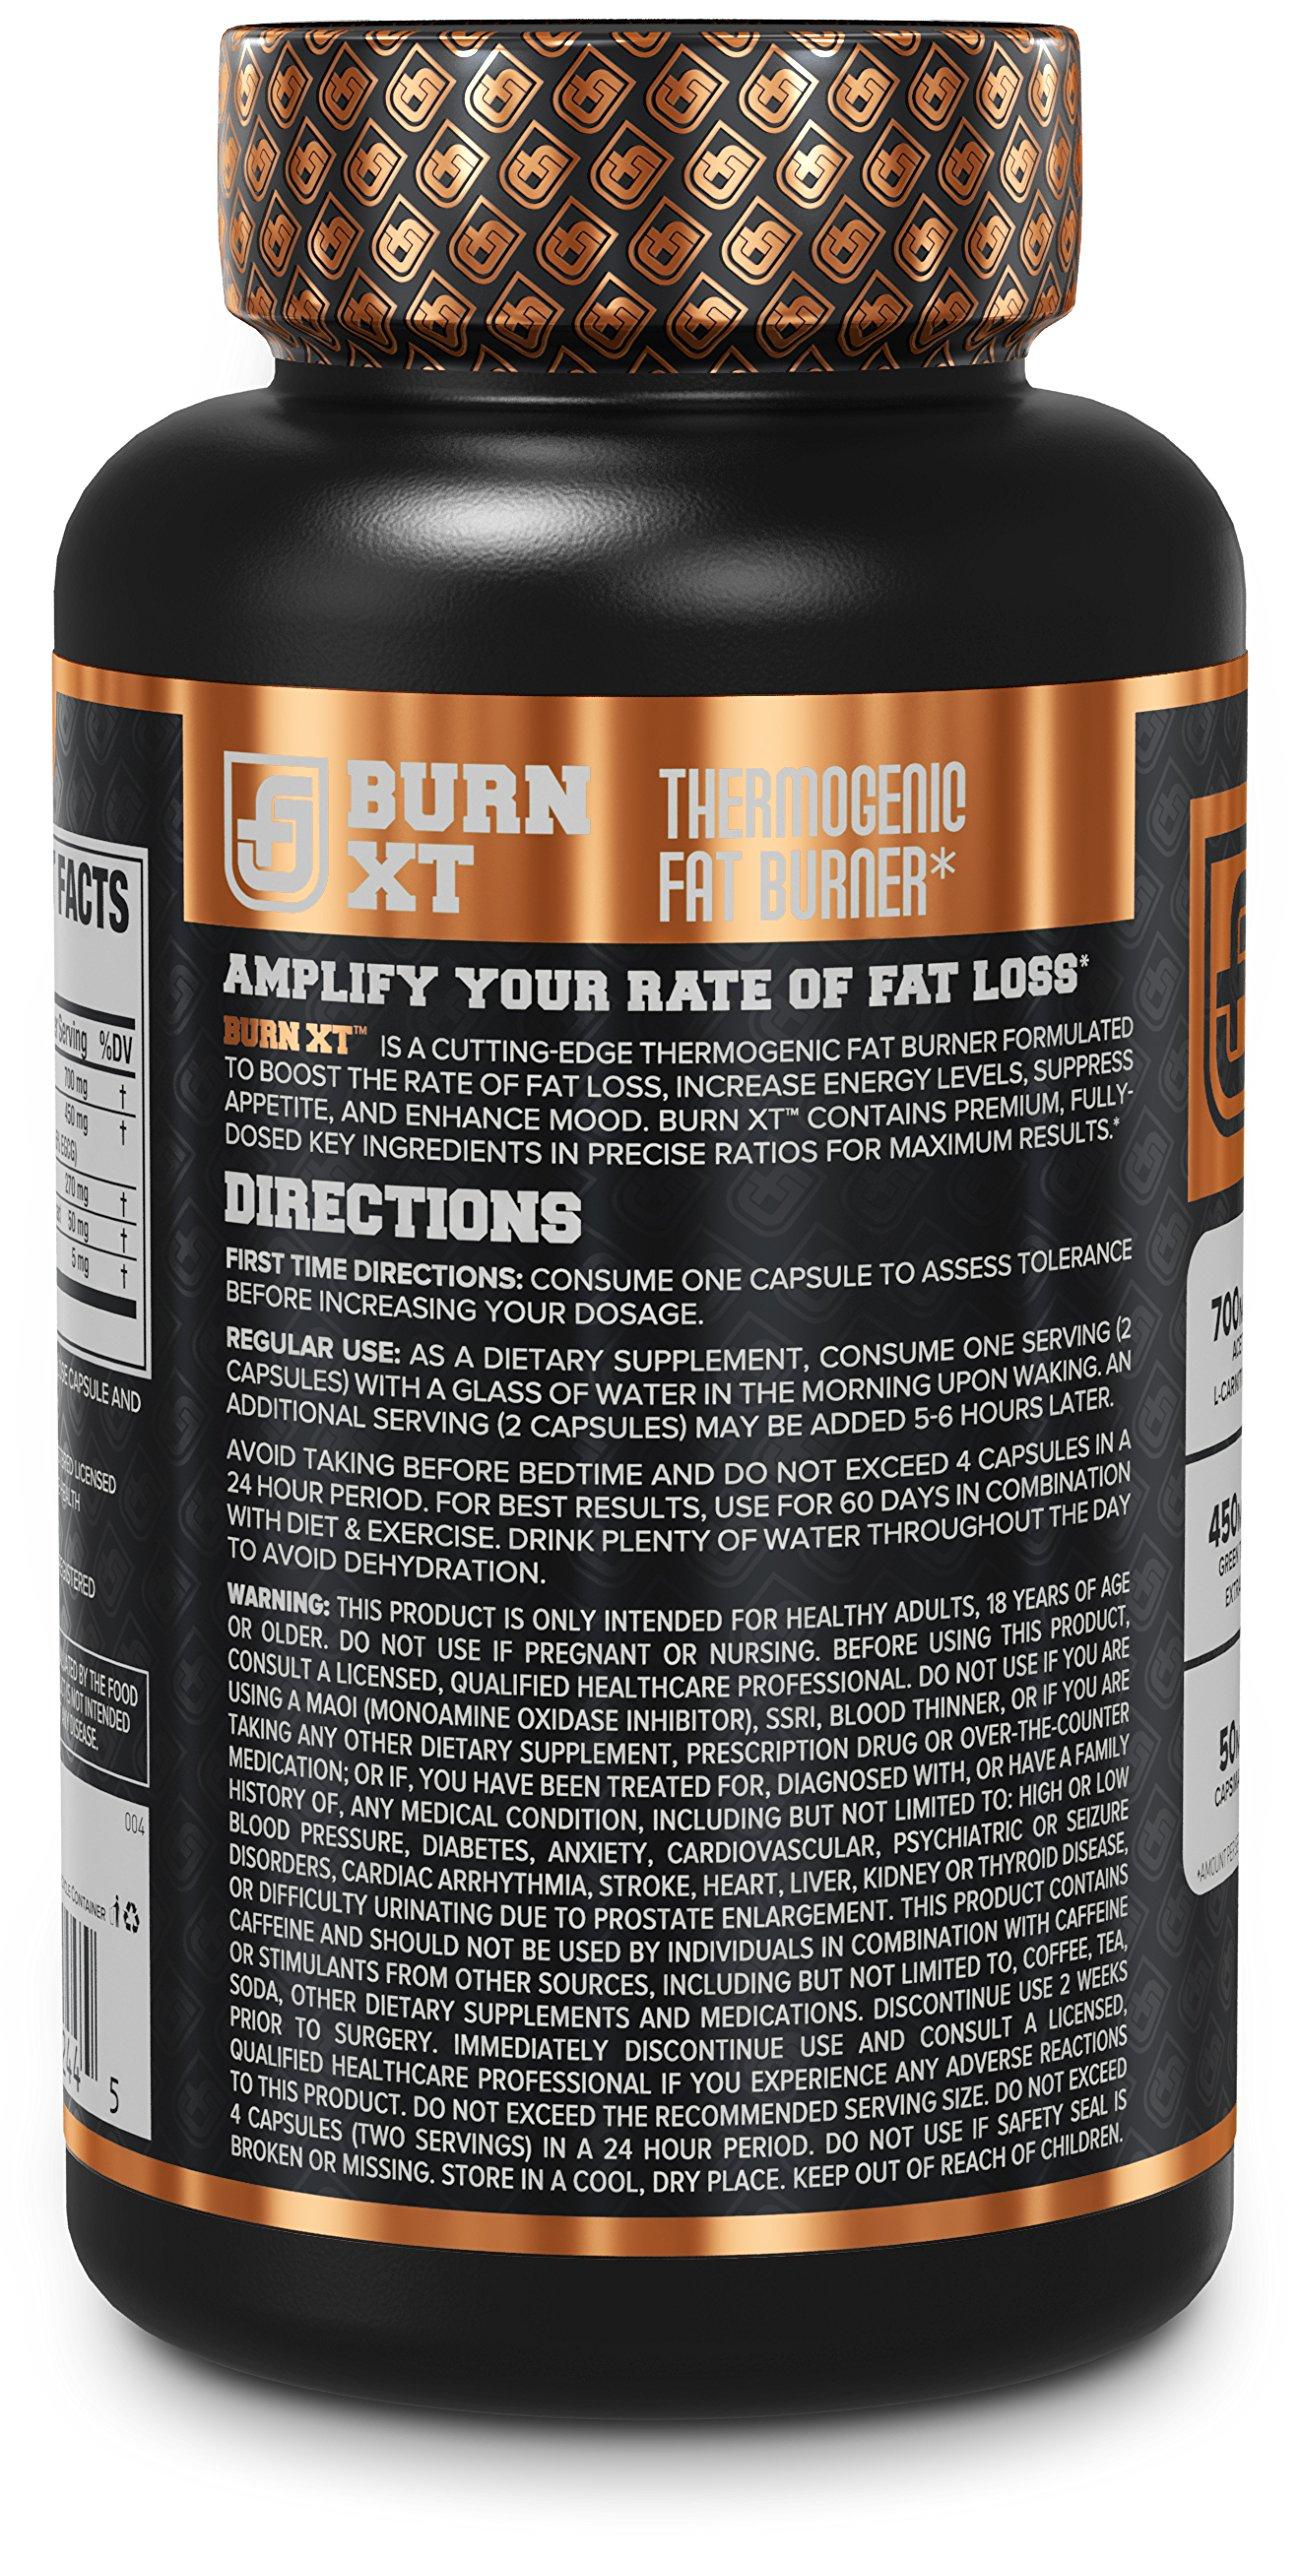 Burn Xt Thermogenic Fat Burner Weight Loss Supplement